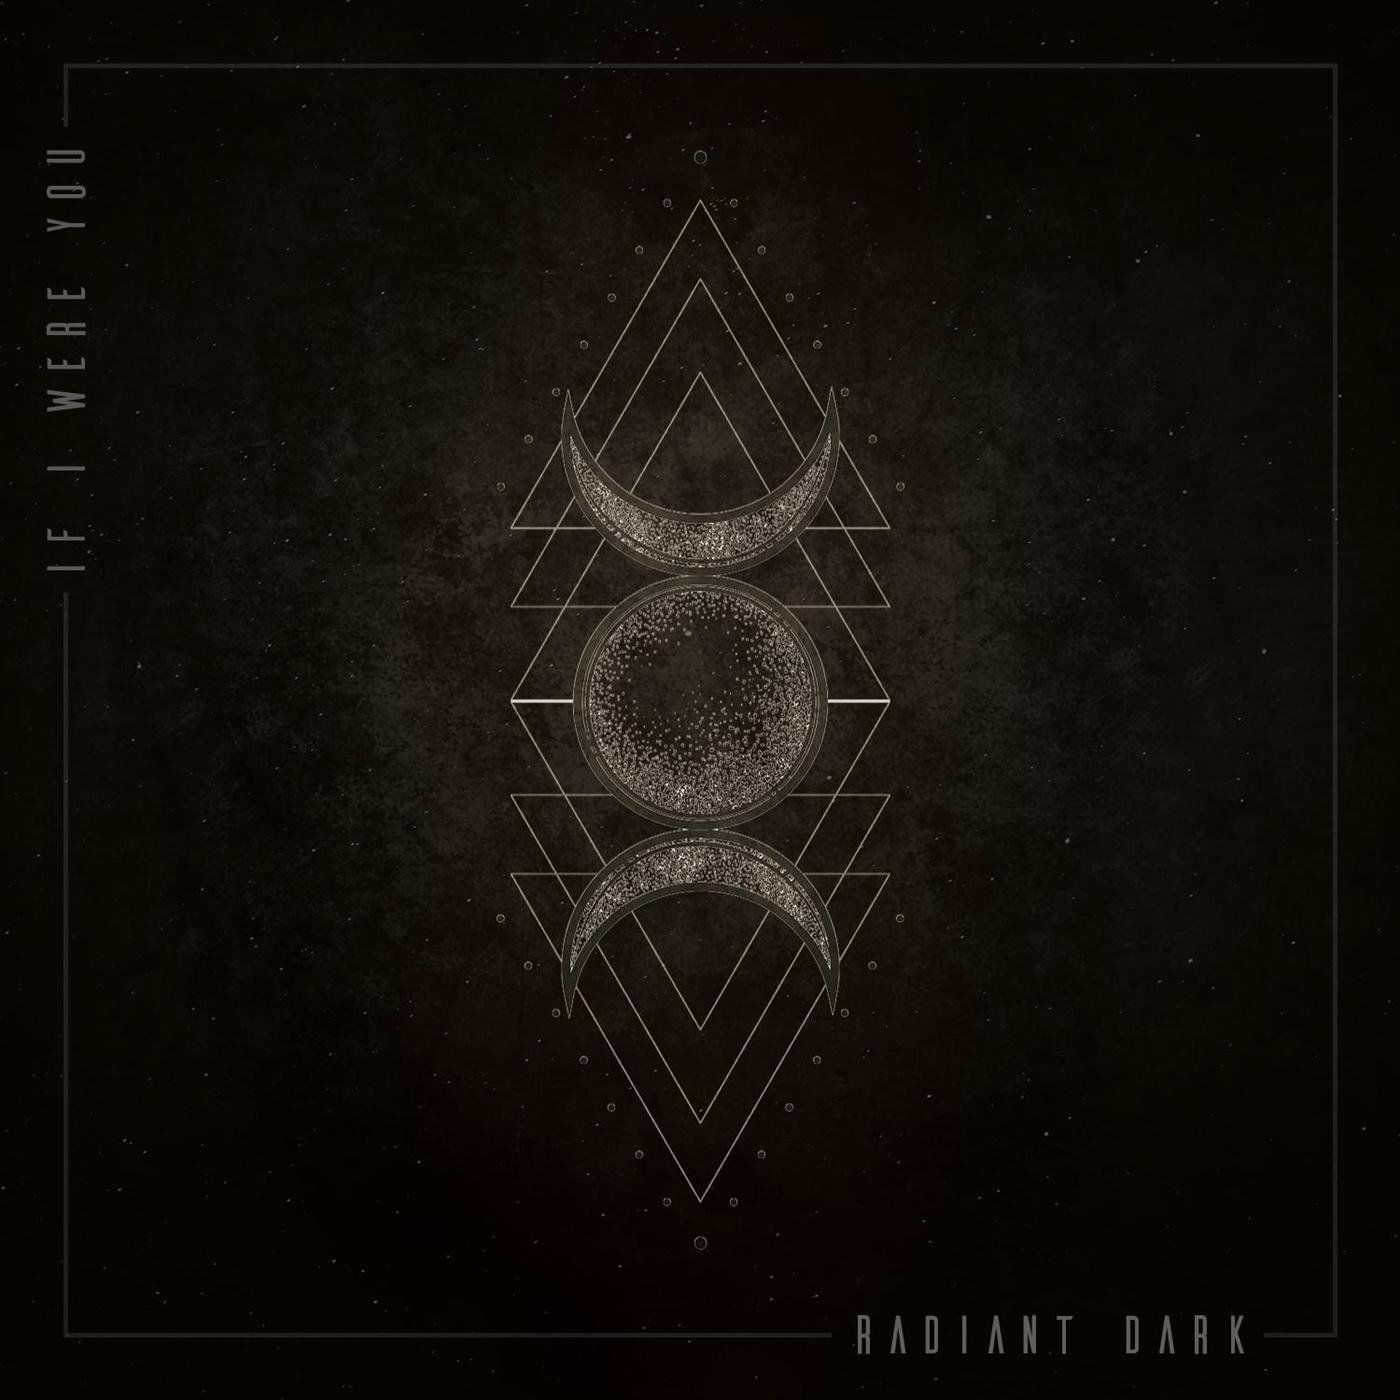 If I Were You - Radiant Dark (2020)